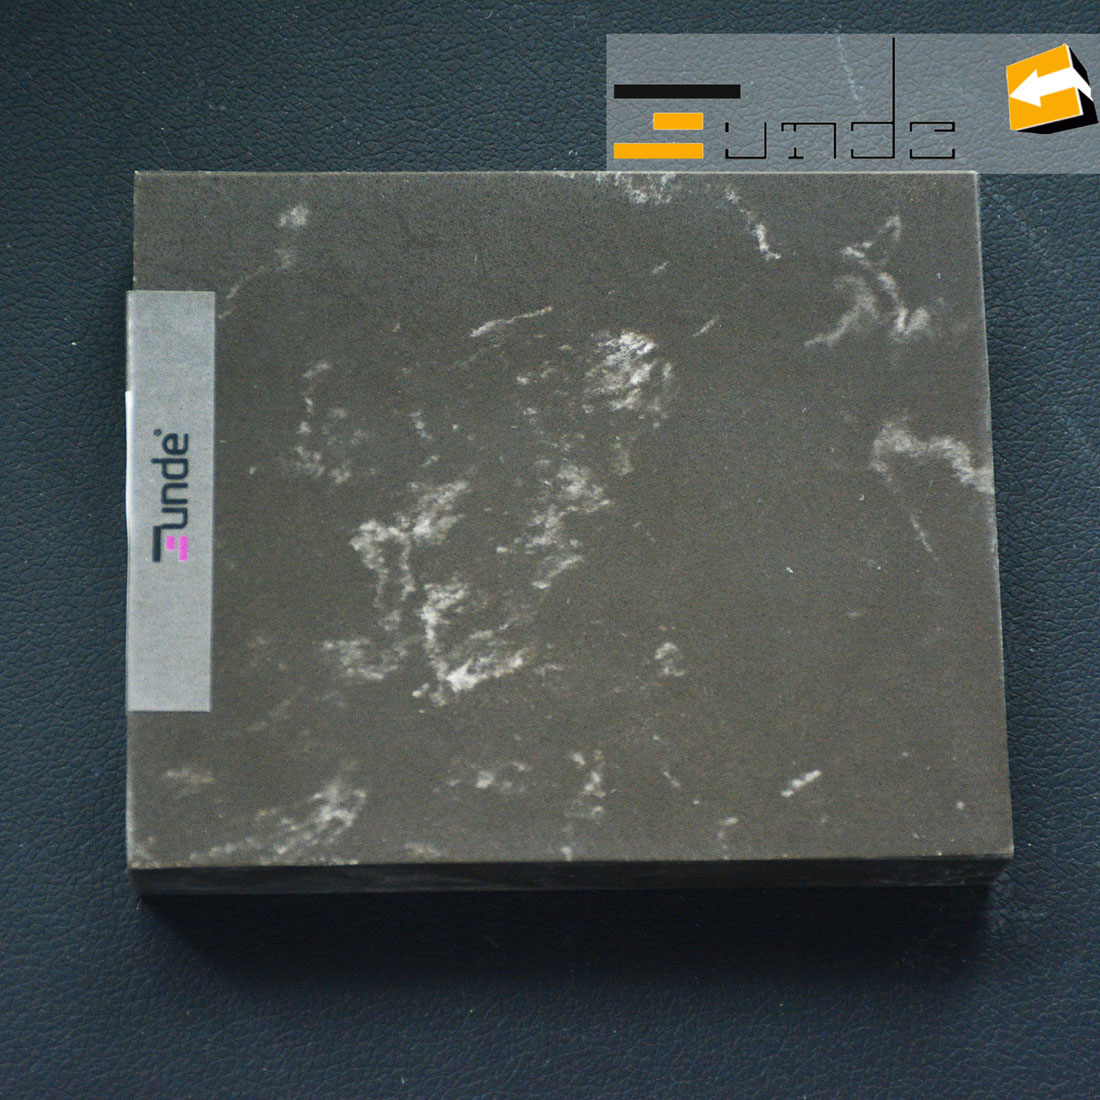 calacatta grey quartz stone jd408-1